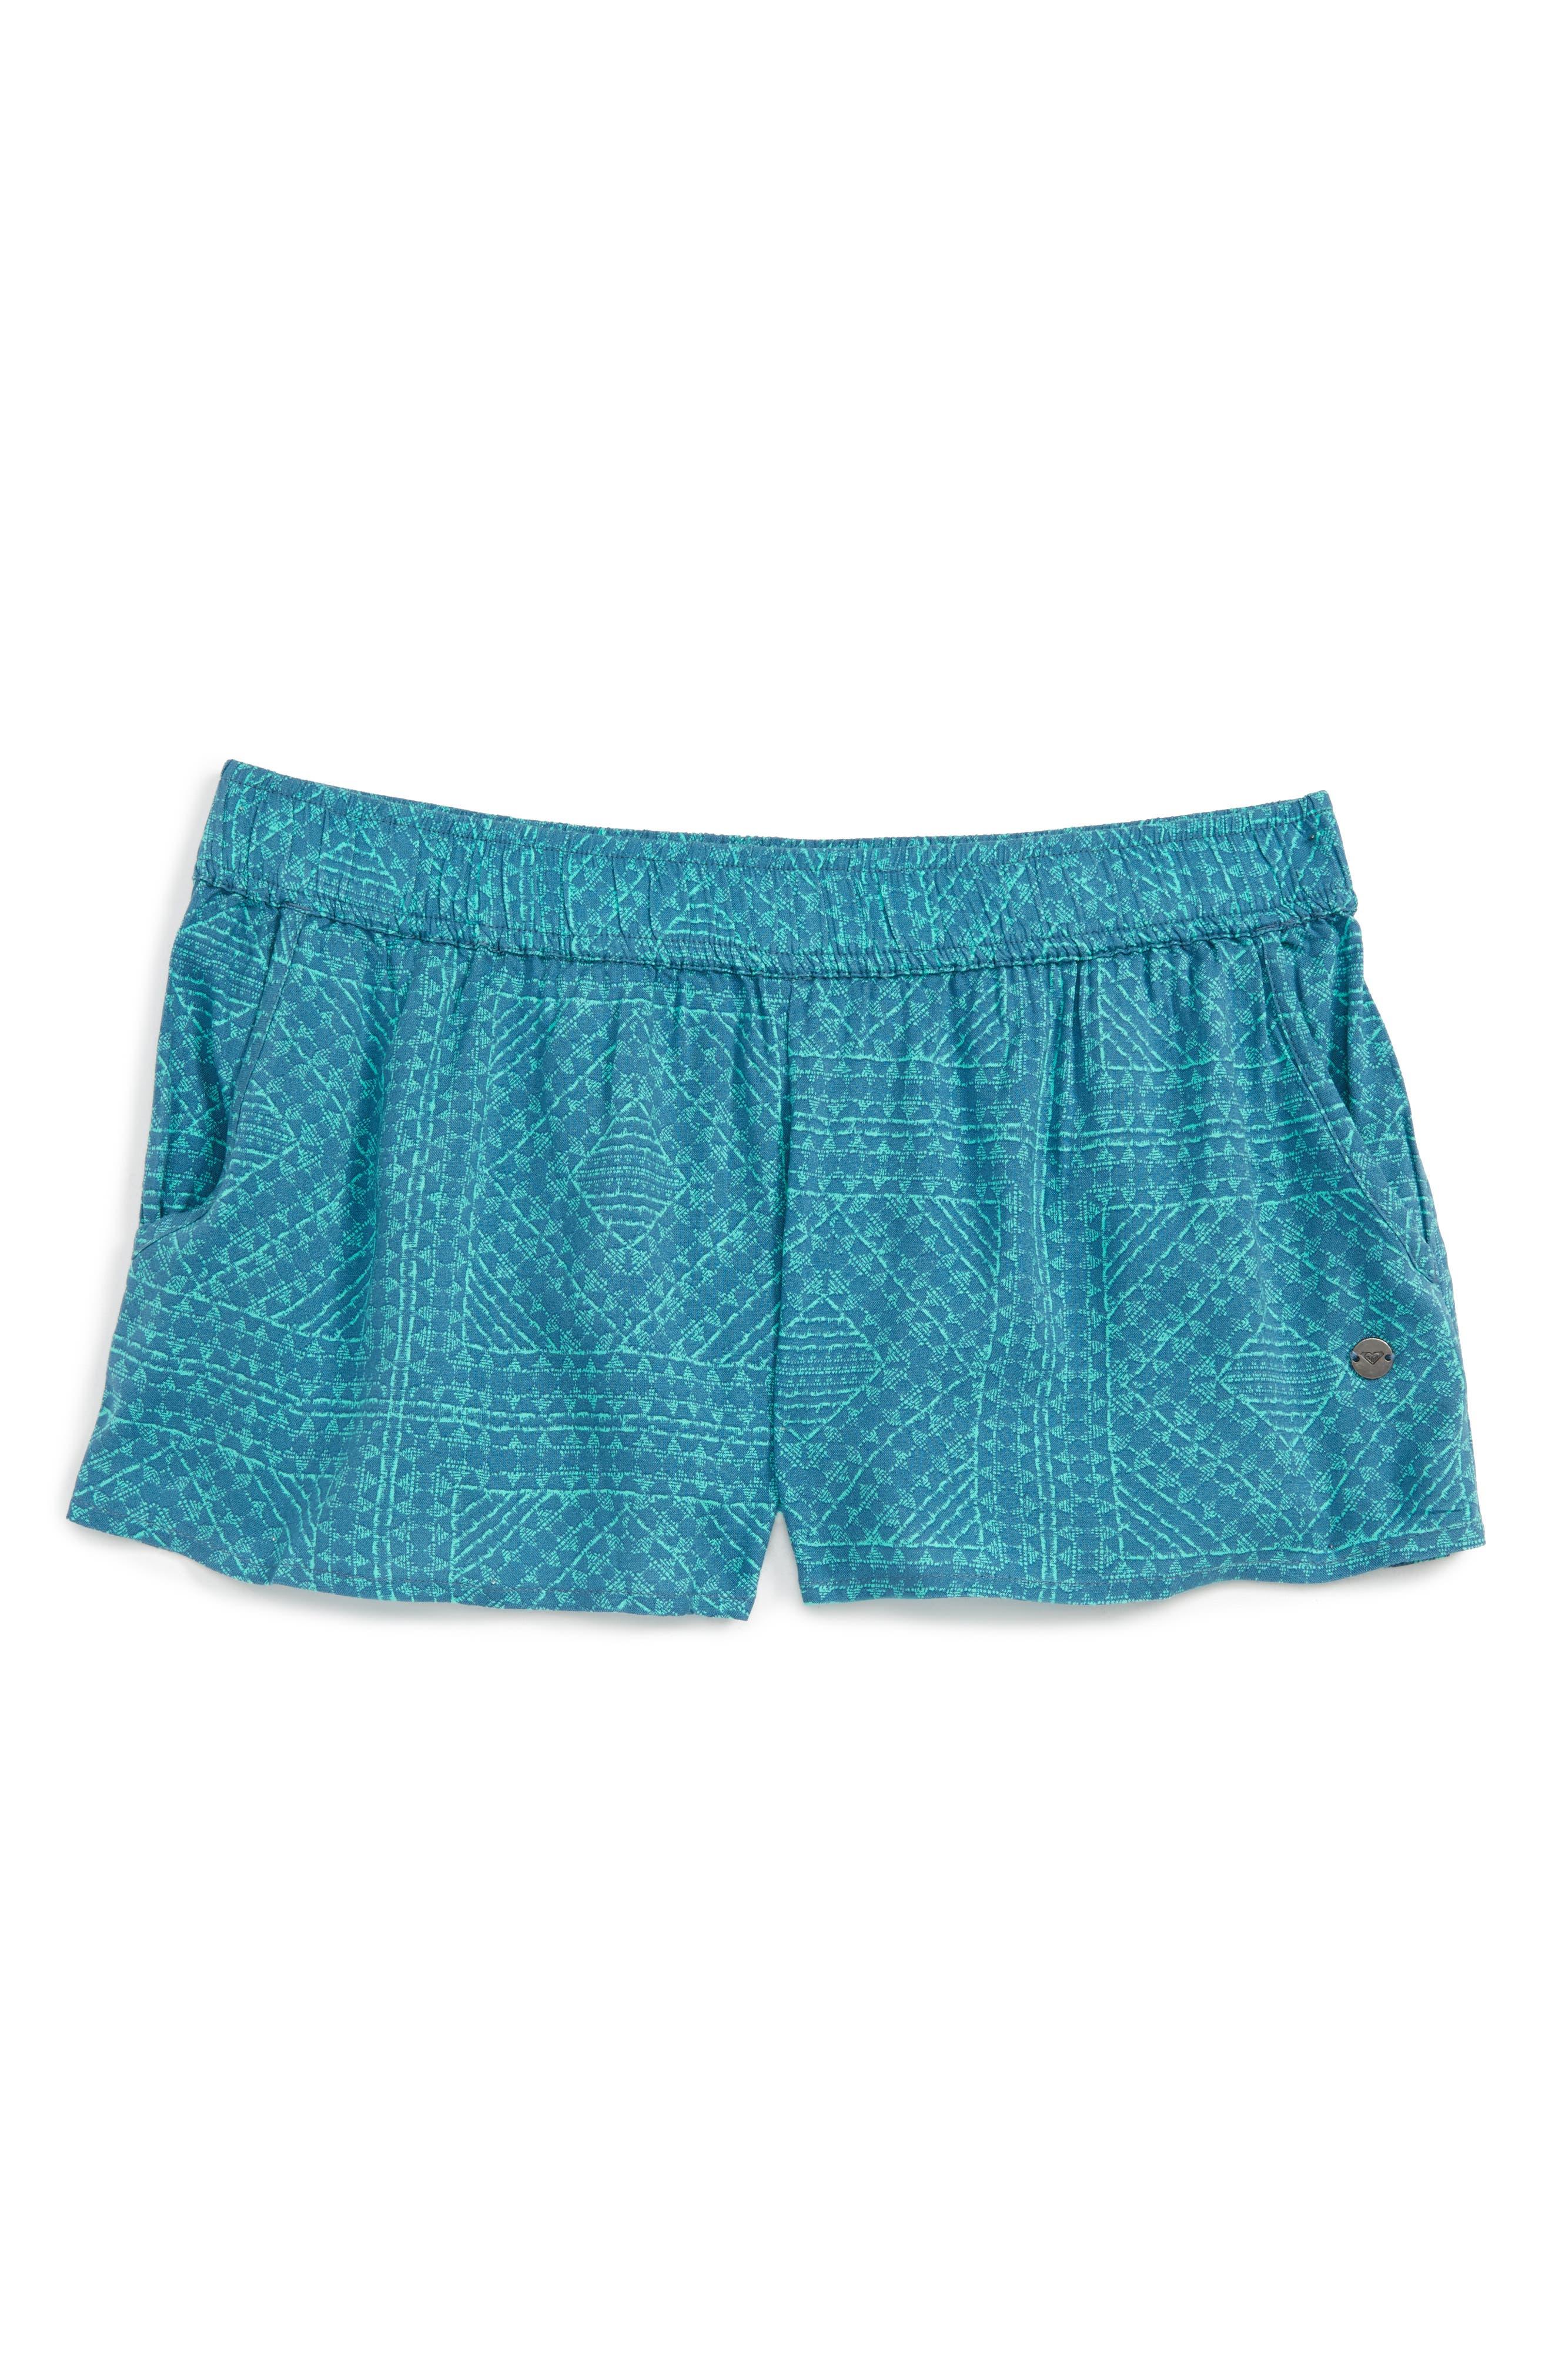 Roxy Something I Will Believe Shorts (Big Girls)